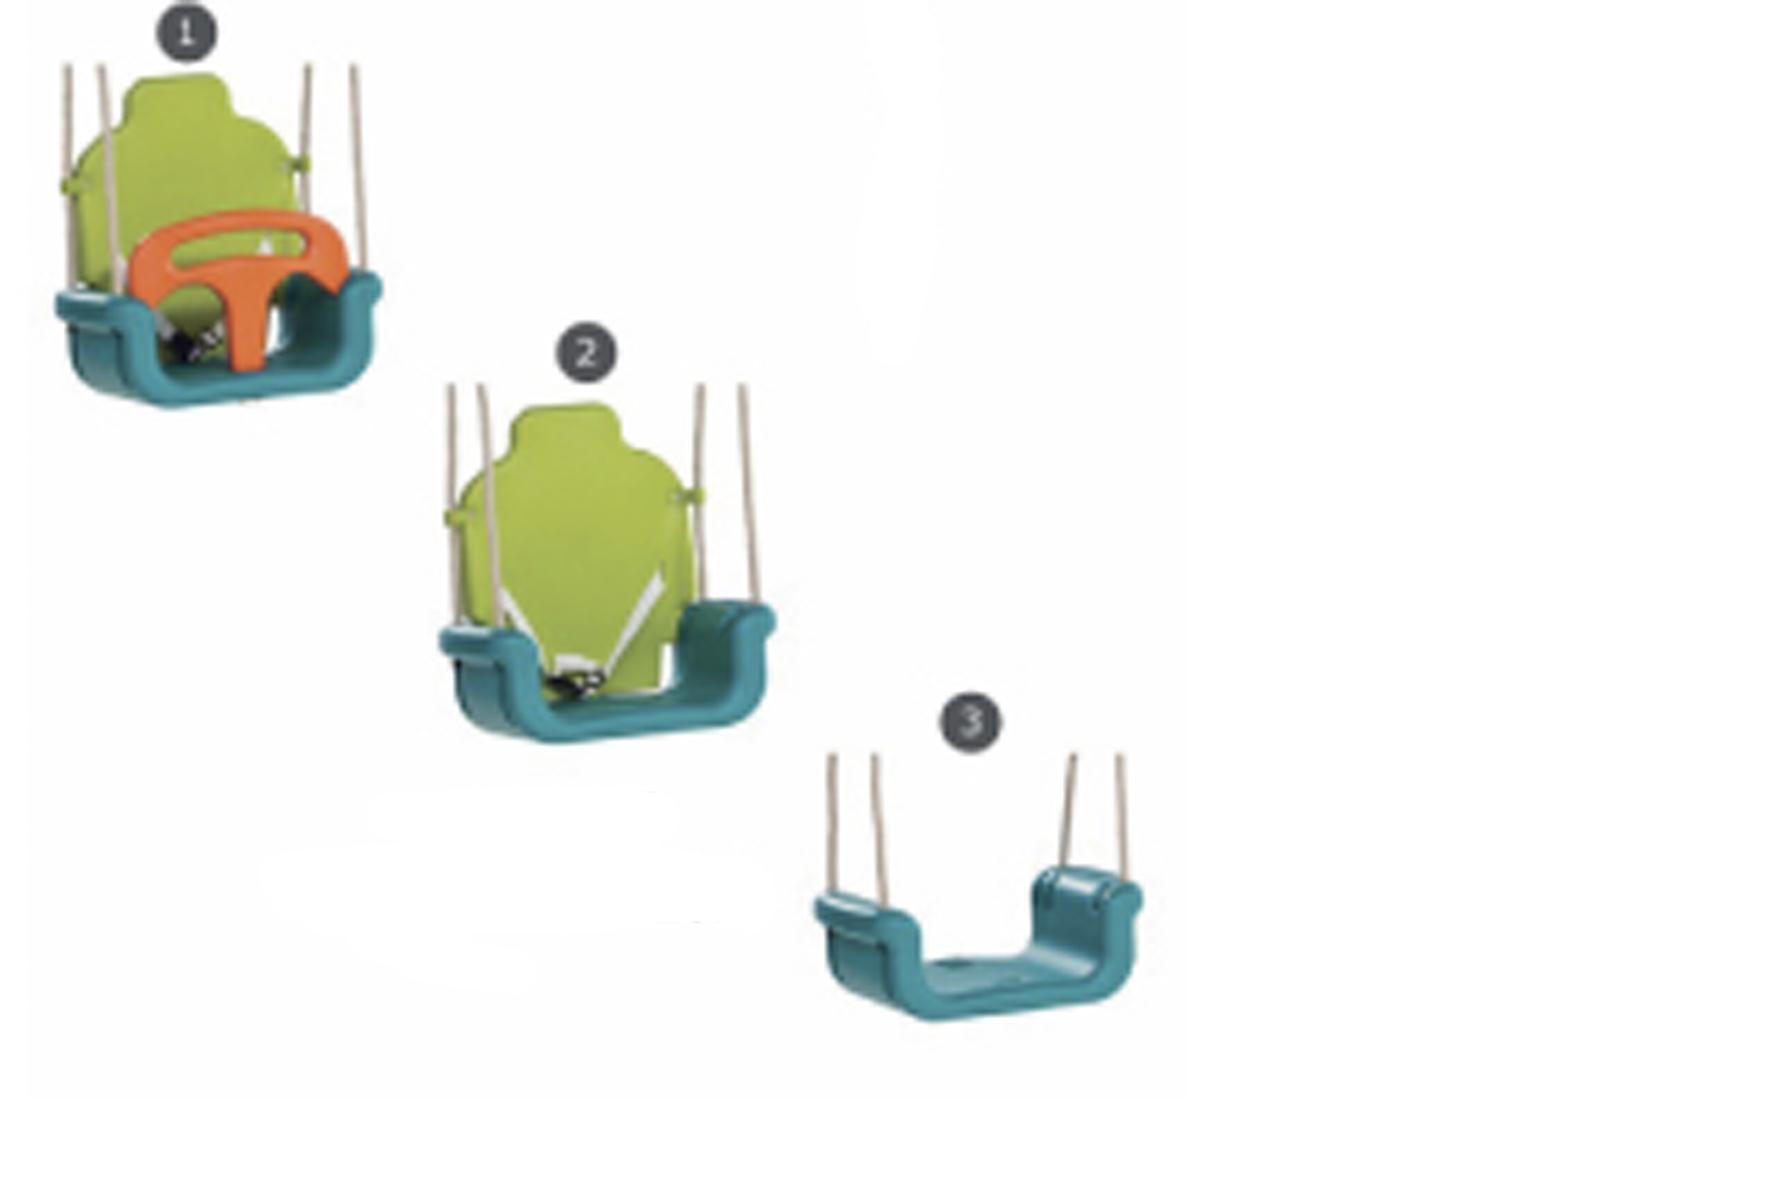 balan oire siege evolutif achat en ligne ou dans notre magasin. Black Bedroom Furniture Sets. Home Design Ideas